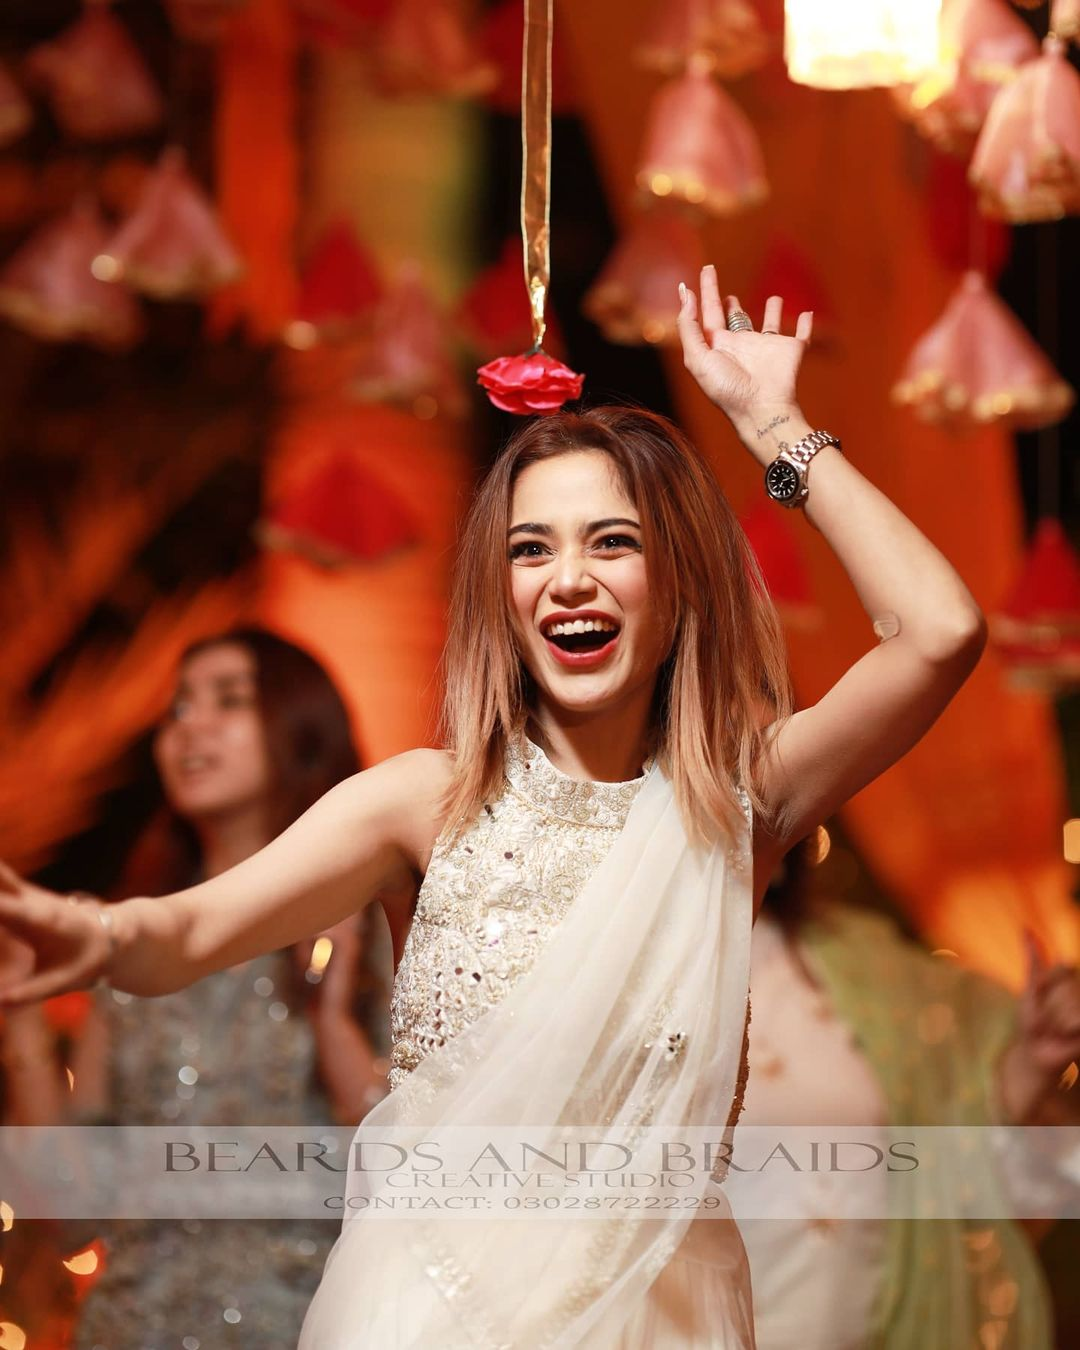 Singer Aima Baig Sister Komal Baig Mayoun Pictures